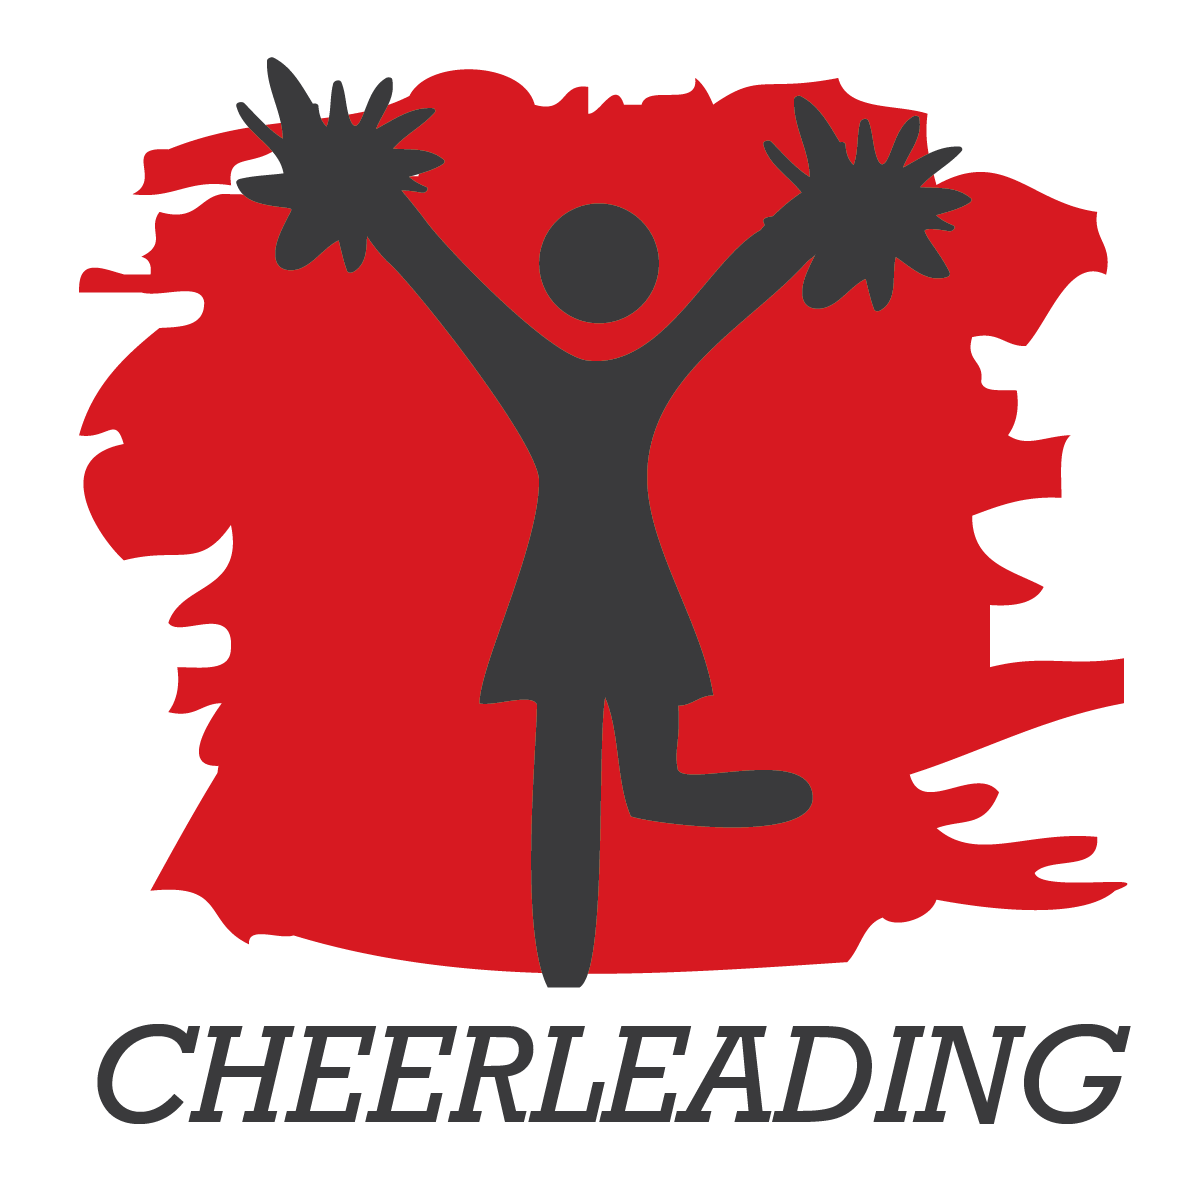 Grade school boys basketball and cheerleaders clipart image library download Cheerleading - Aurora Christian Schools image library download